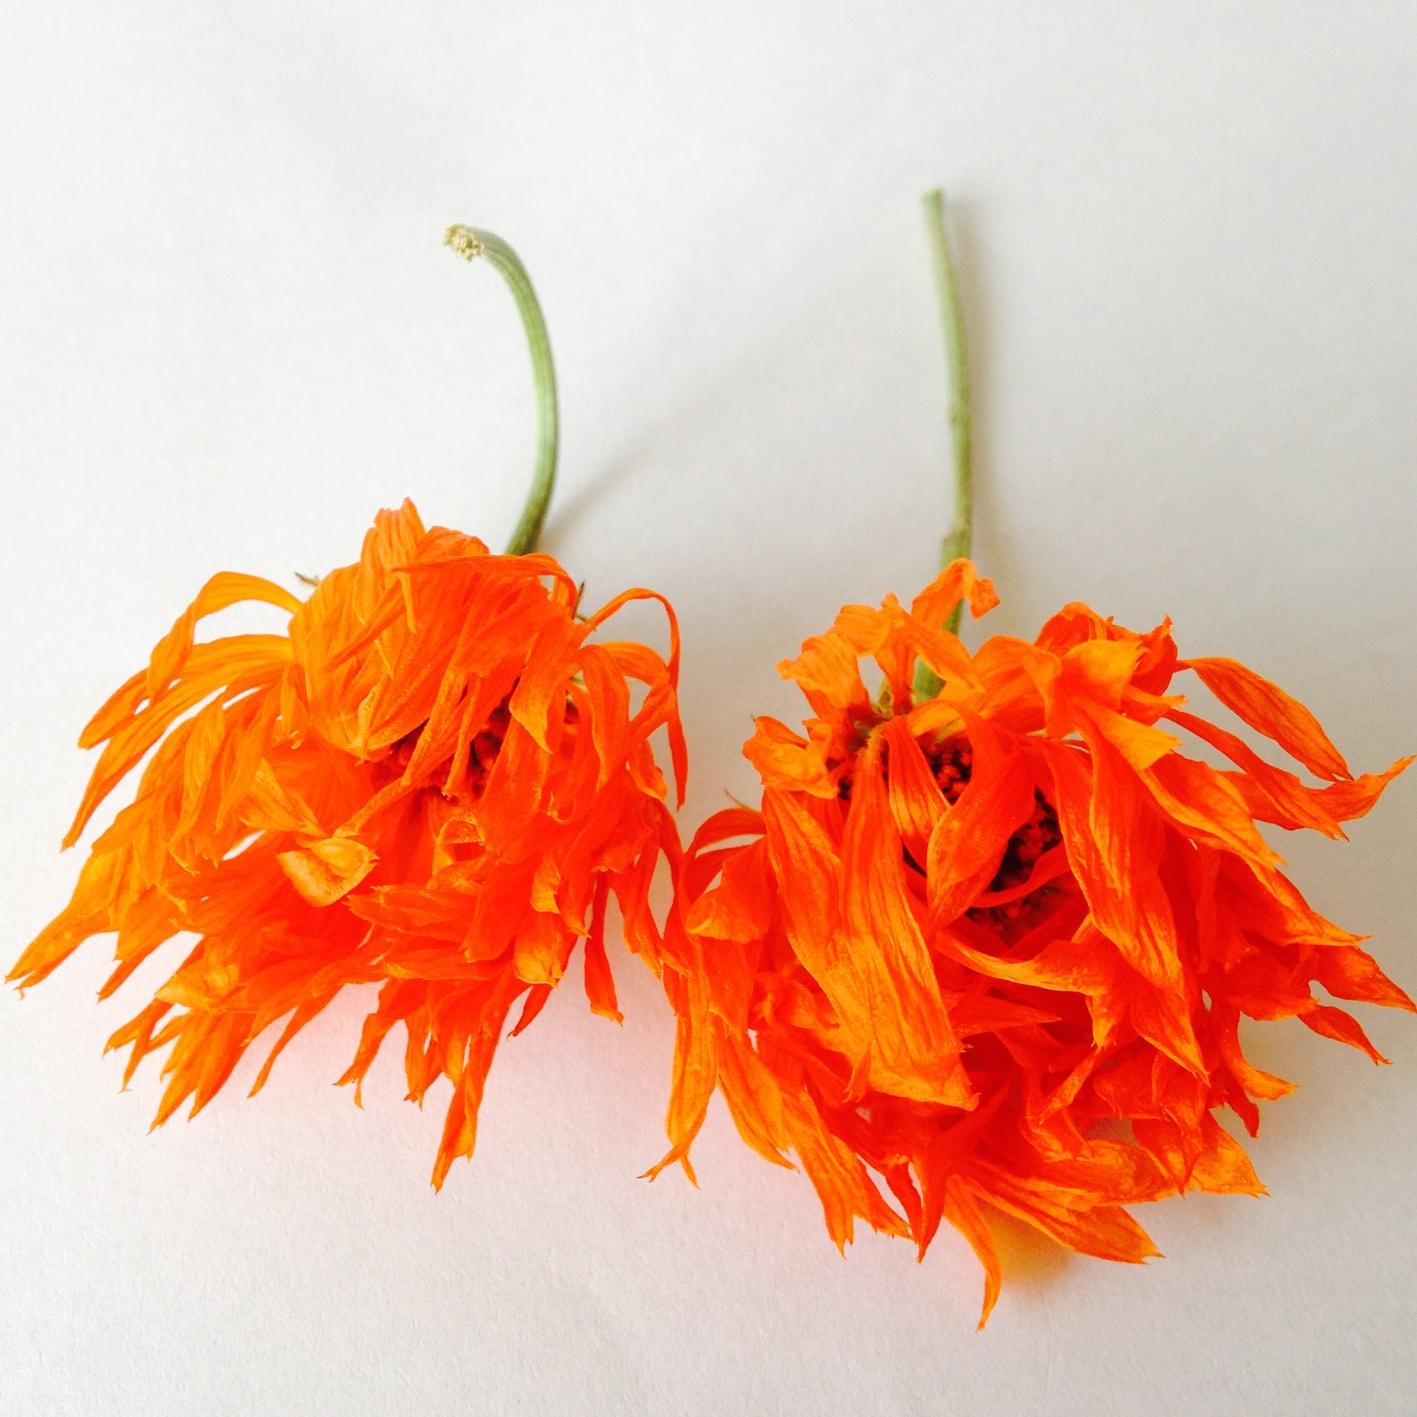 dry calendula